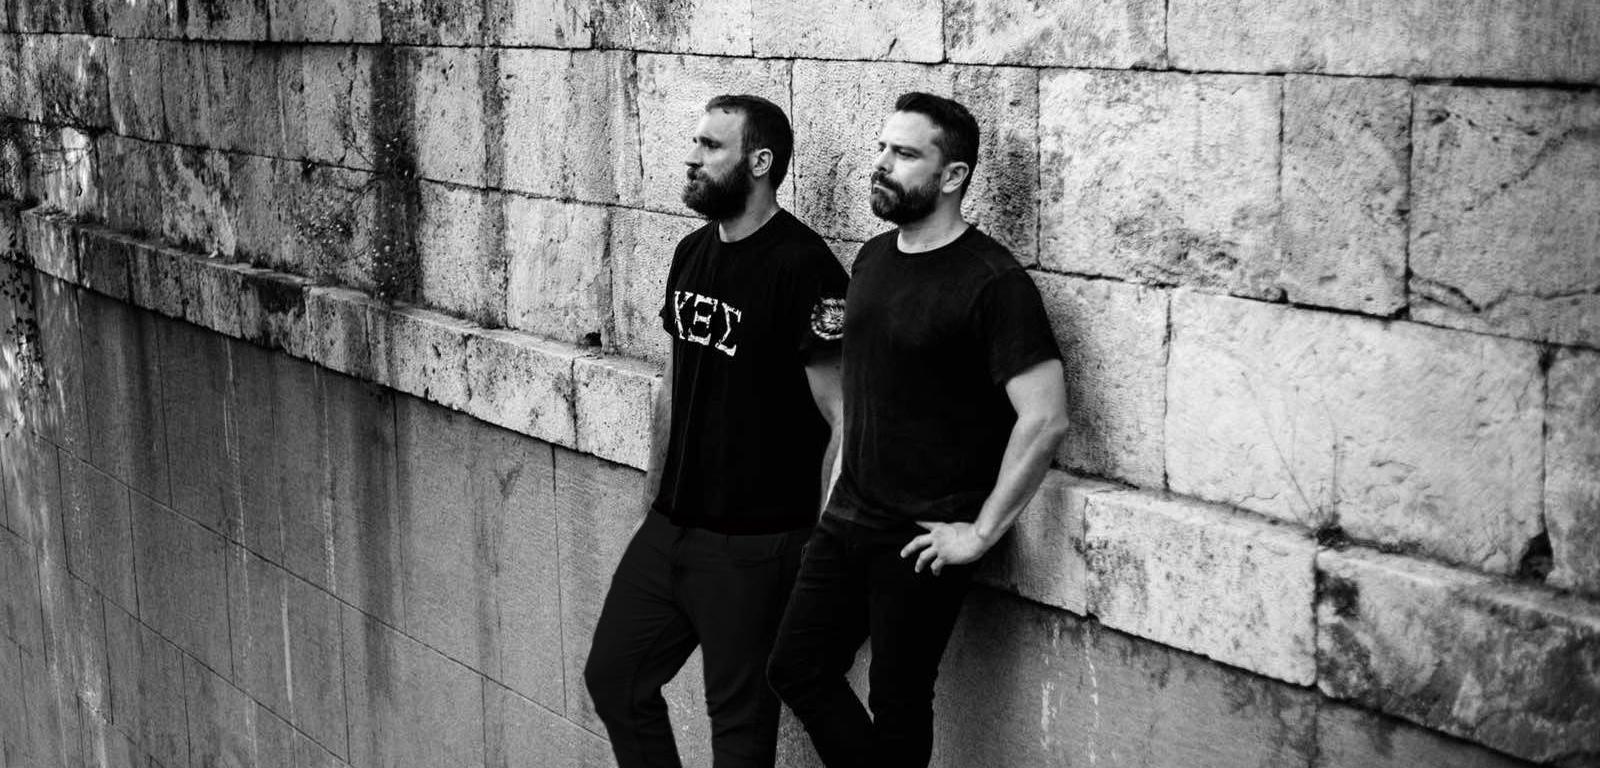 ELDINGAR set to release debut album Maenads this Summer